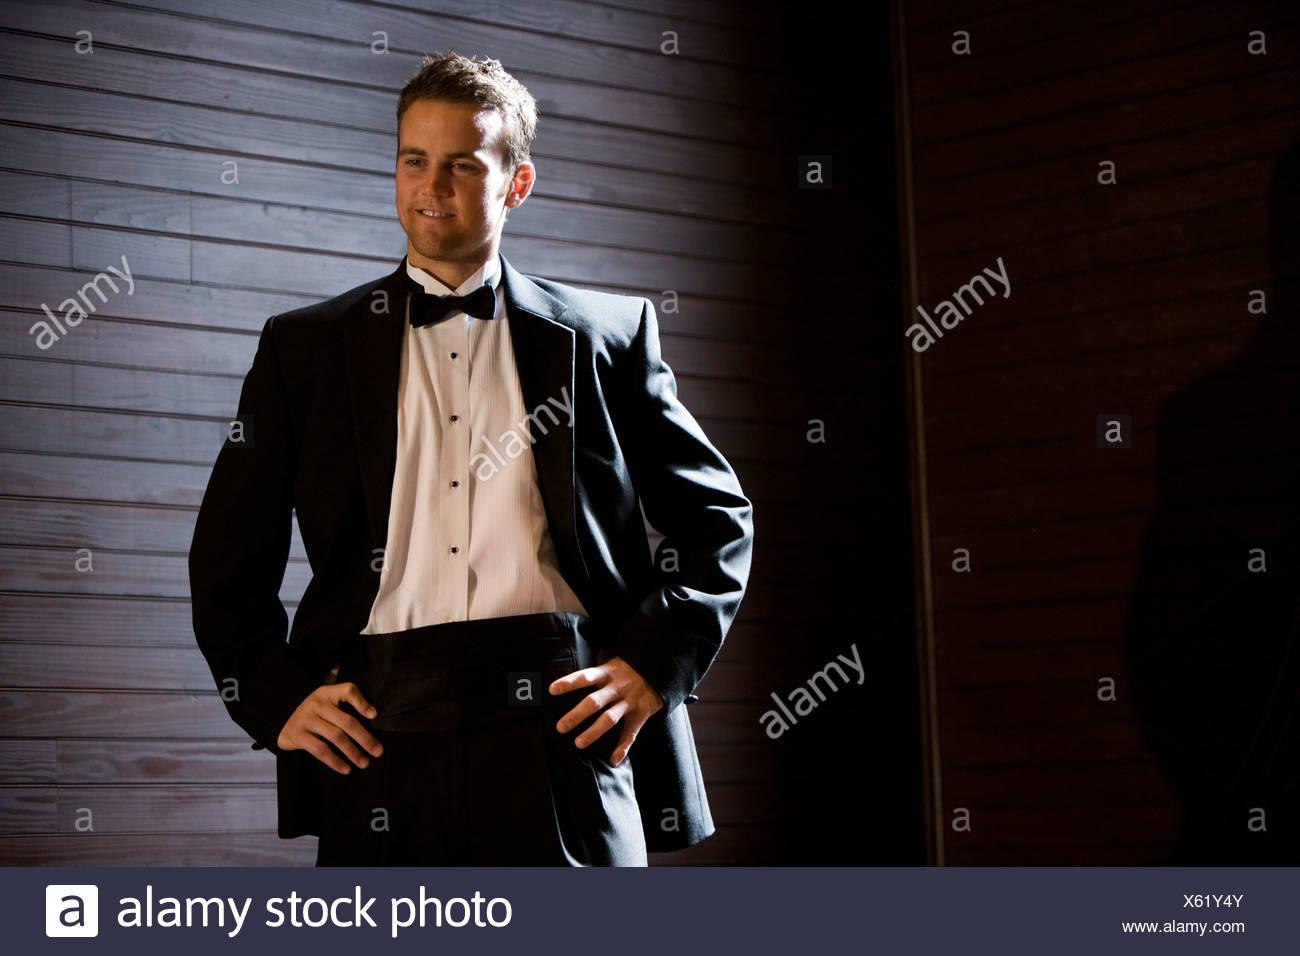 Young groom posing in tuxedo - Stock Image